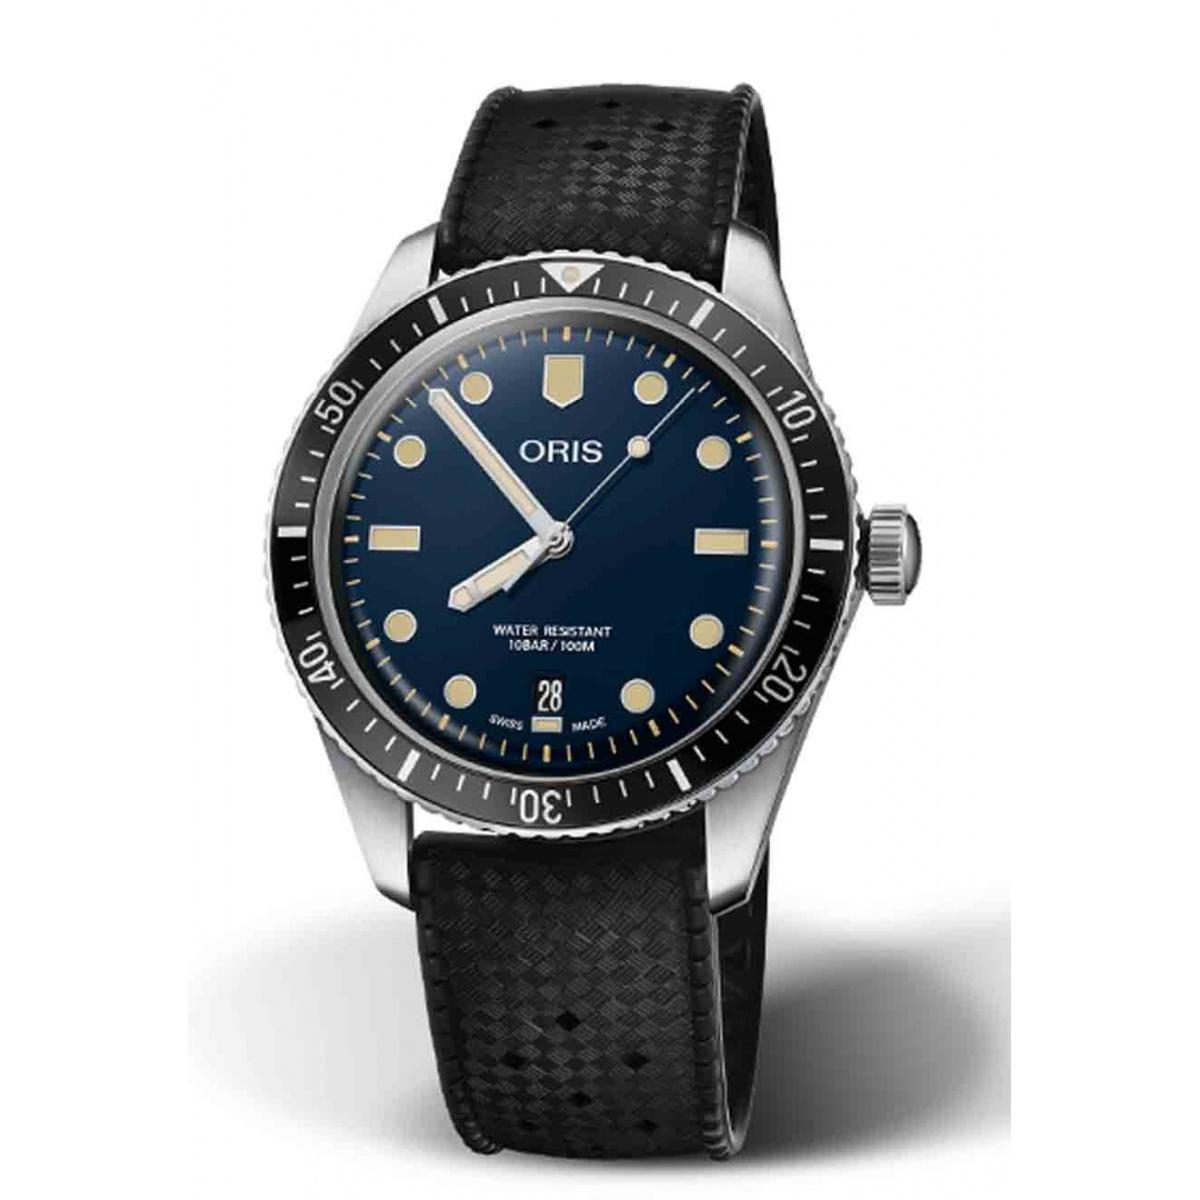 ORIS DIVERS SIXTY-FIVE 100 M ∅40 mm, Esfera azul, brazalete de caucho negro